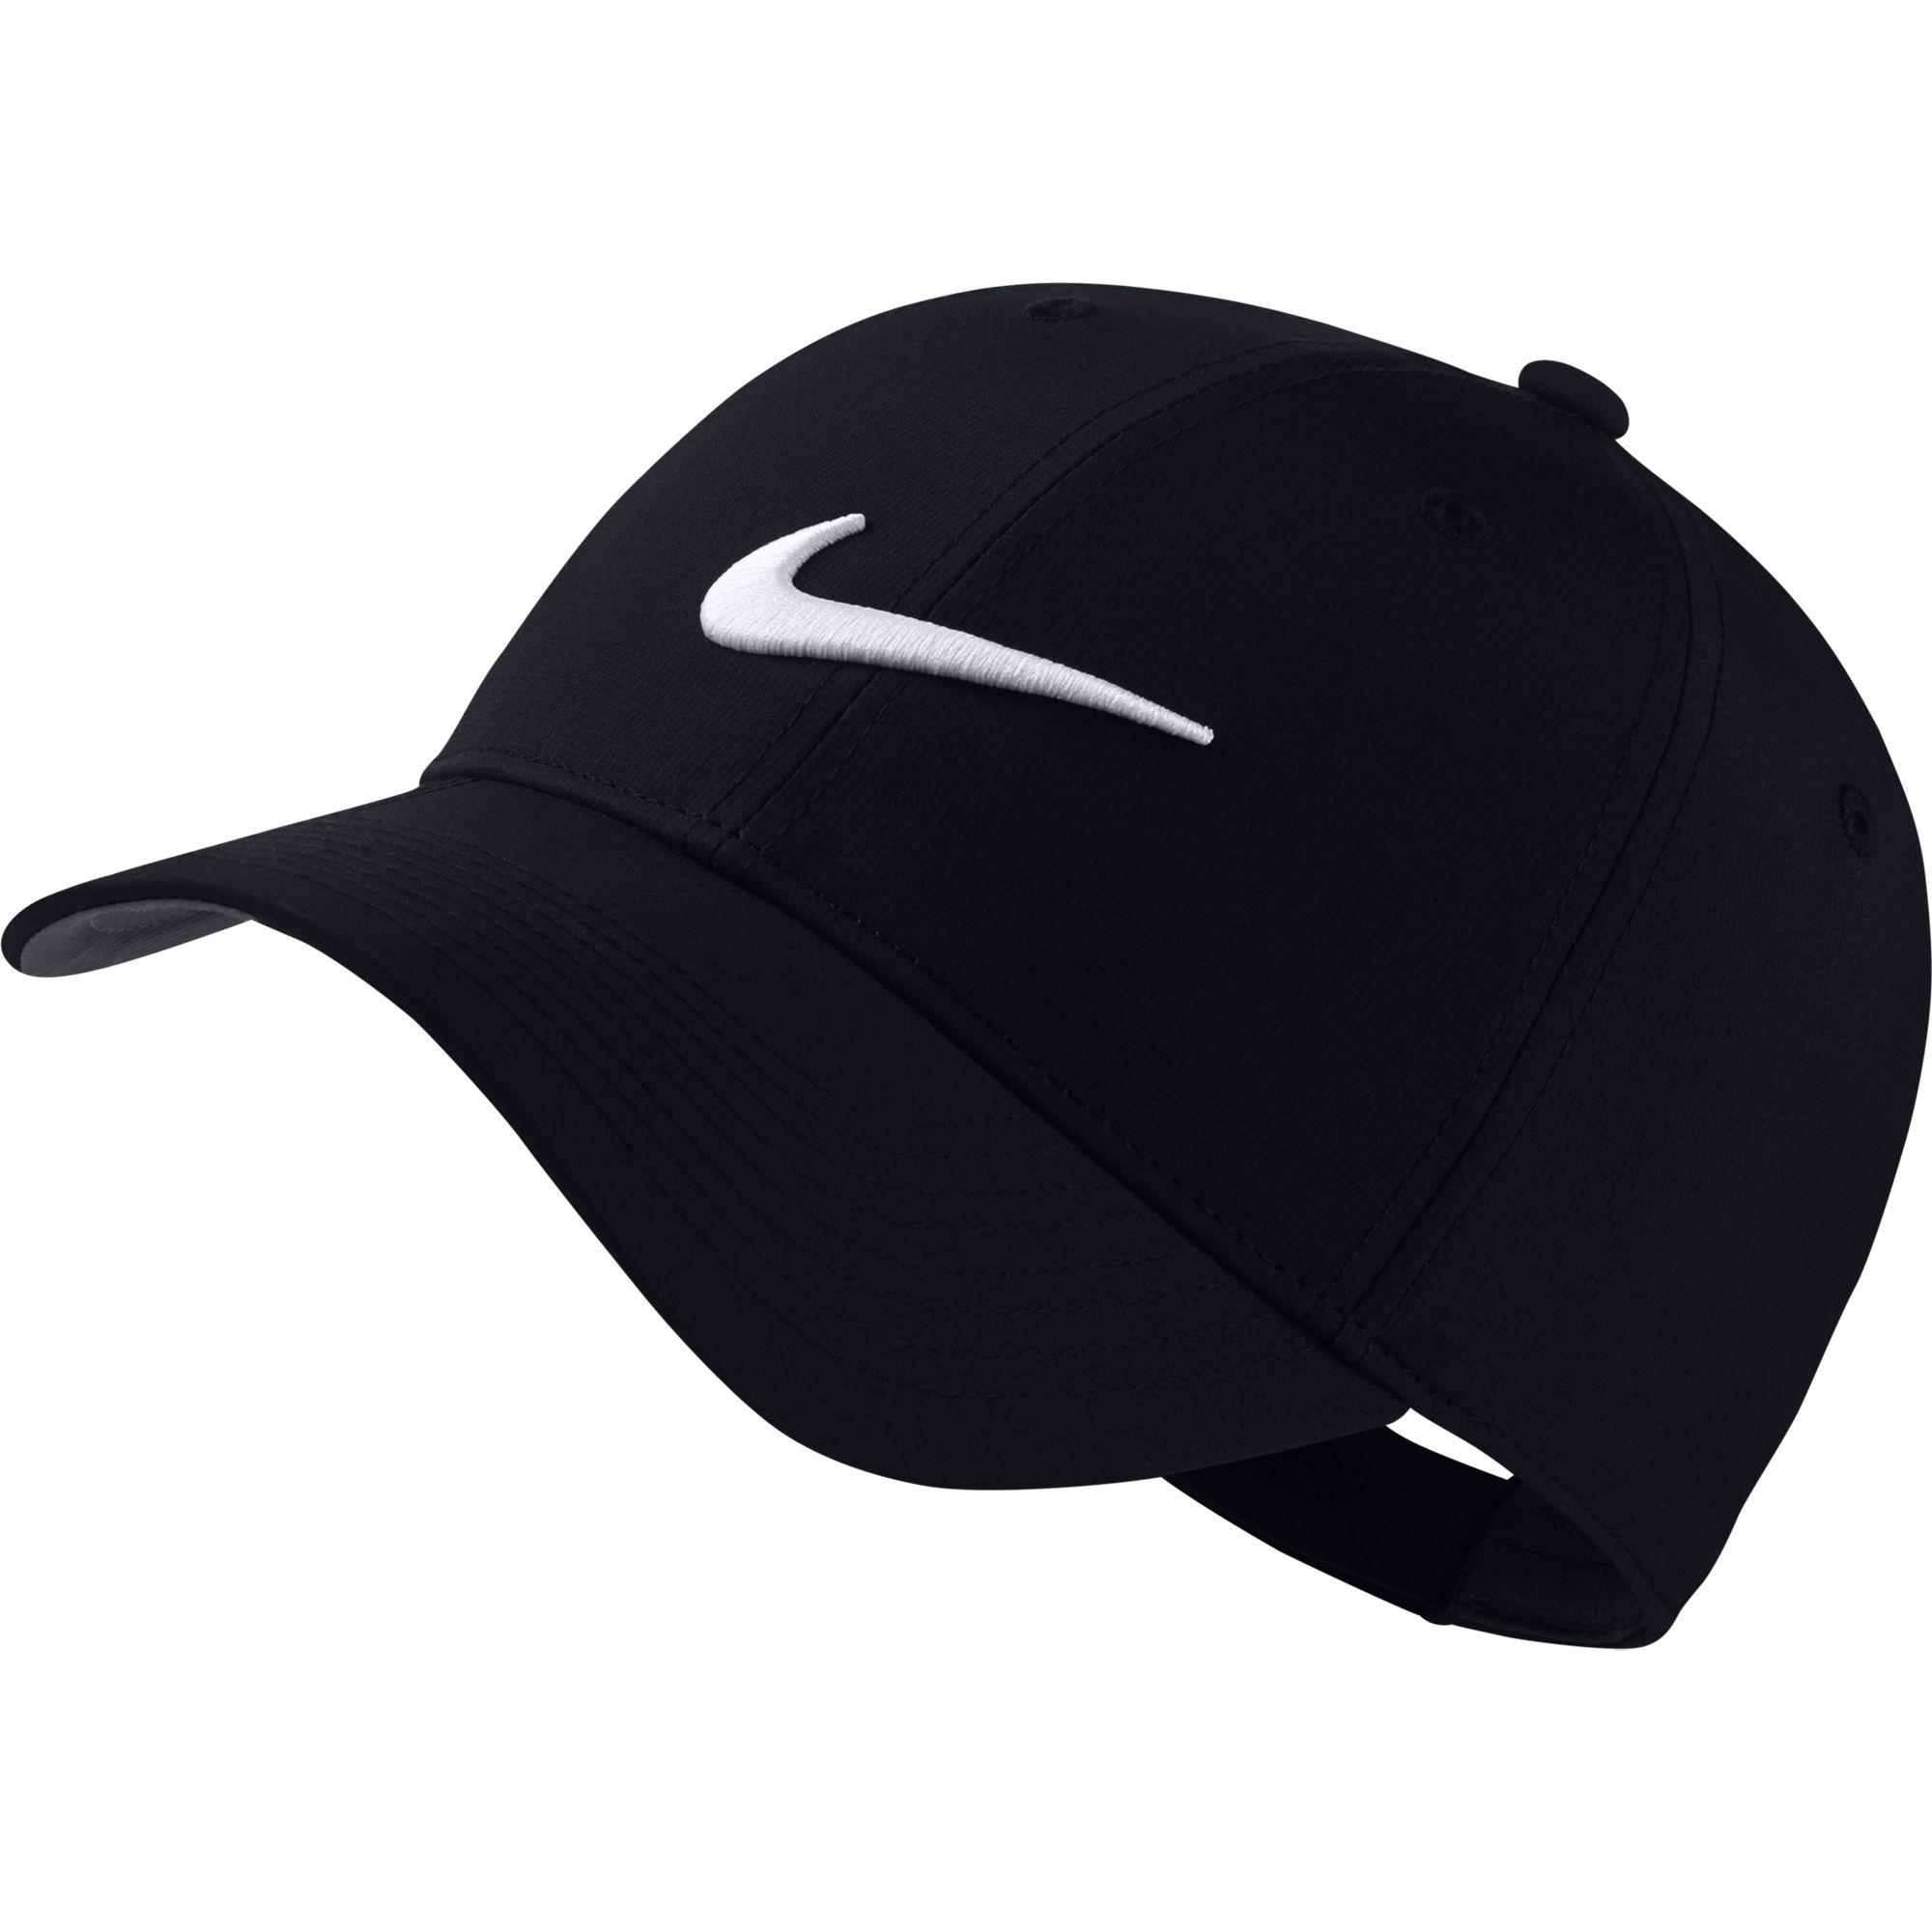 Legacy 91 Golf Hat, Black, swatch